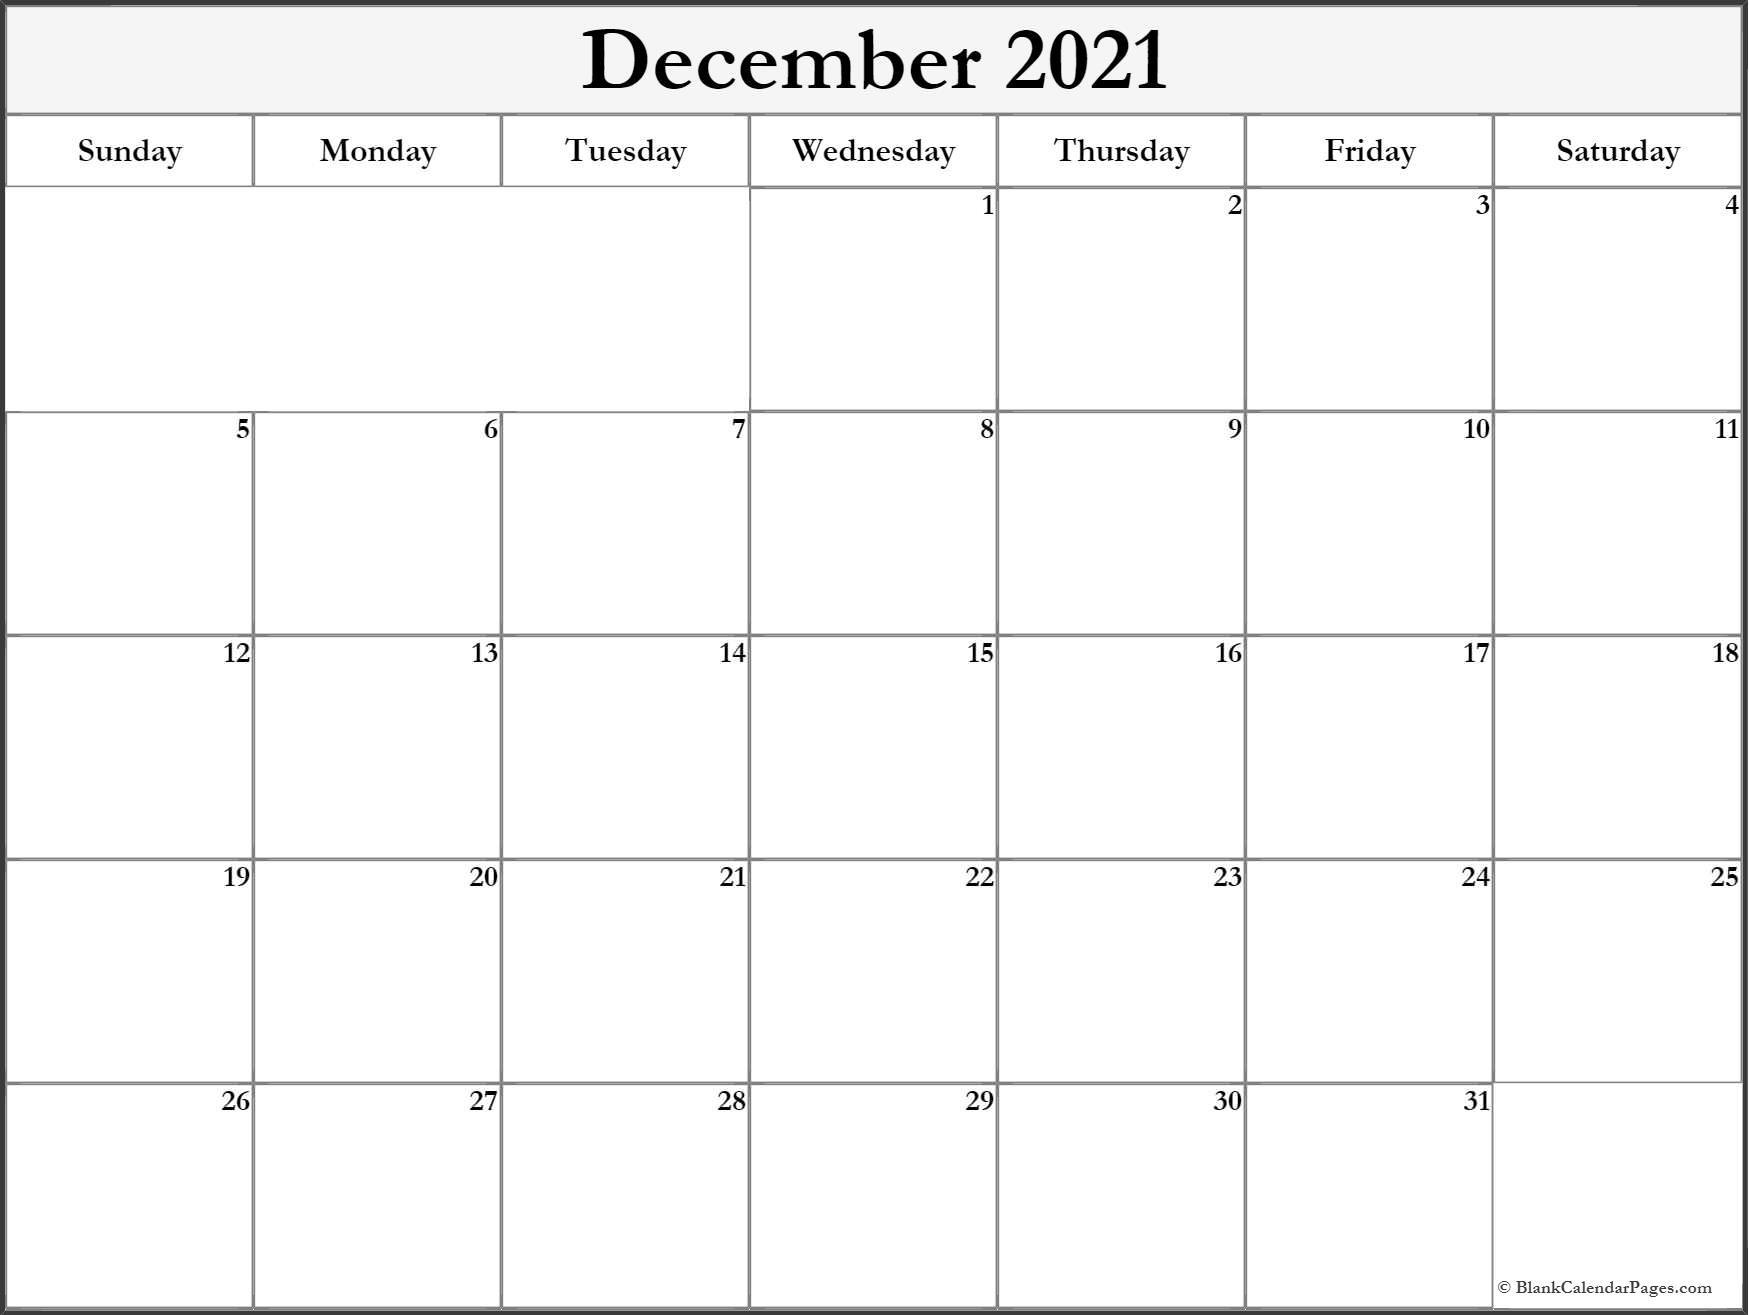 December 2021 Blank Calendar Templates.-2021 Printable Calendar From October Thru December